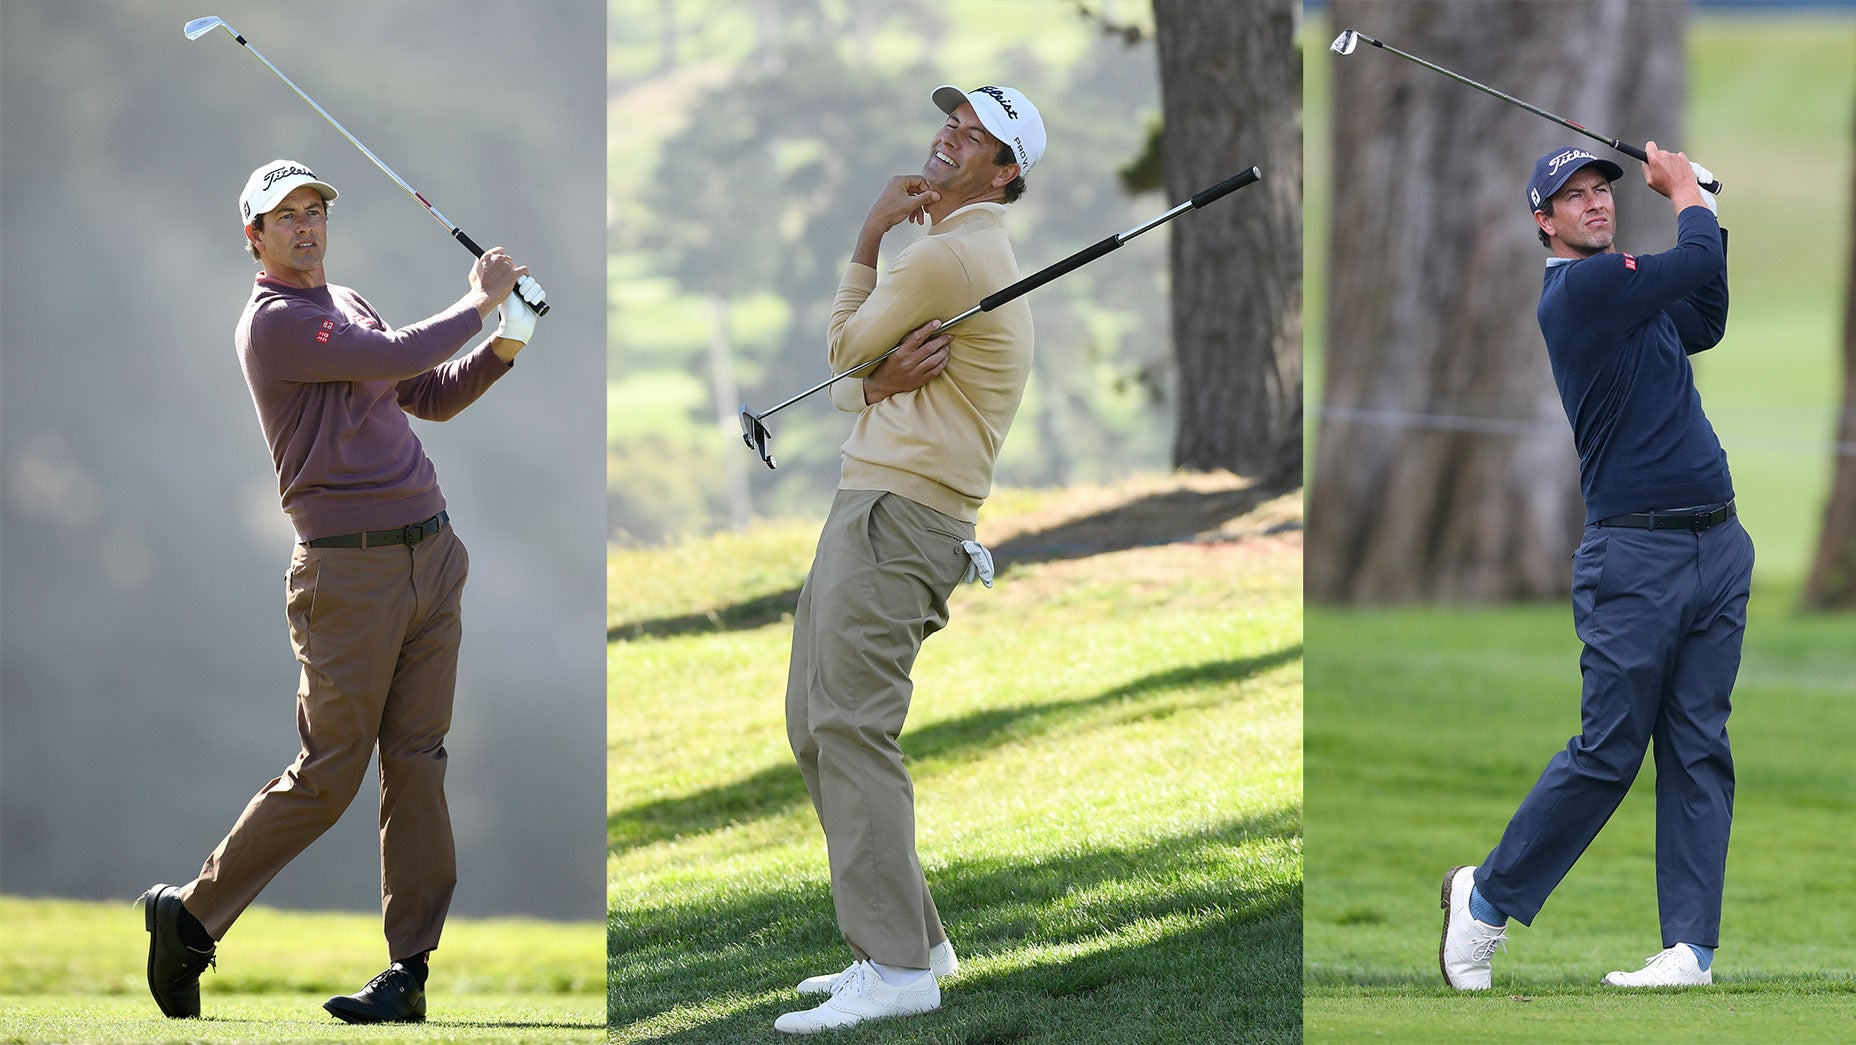 In defense of Adam Scott's monochrome PGA Championship look